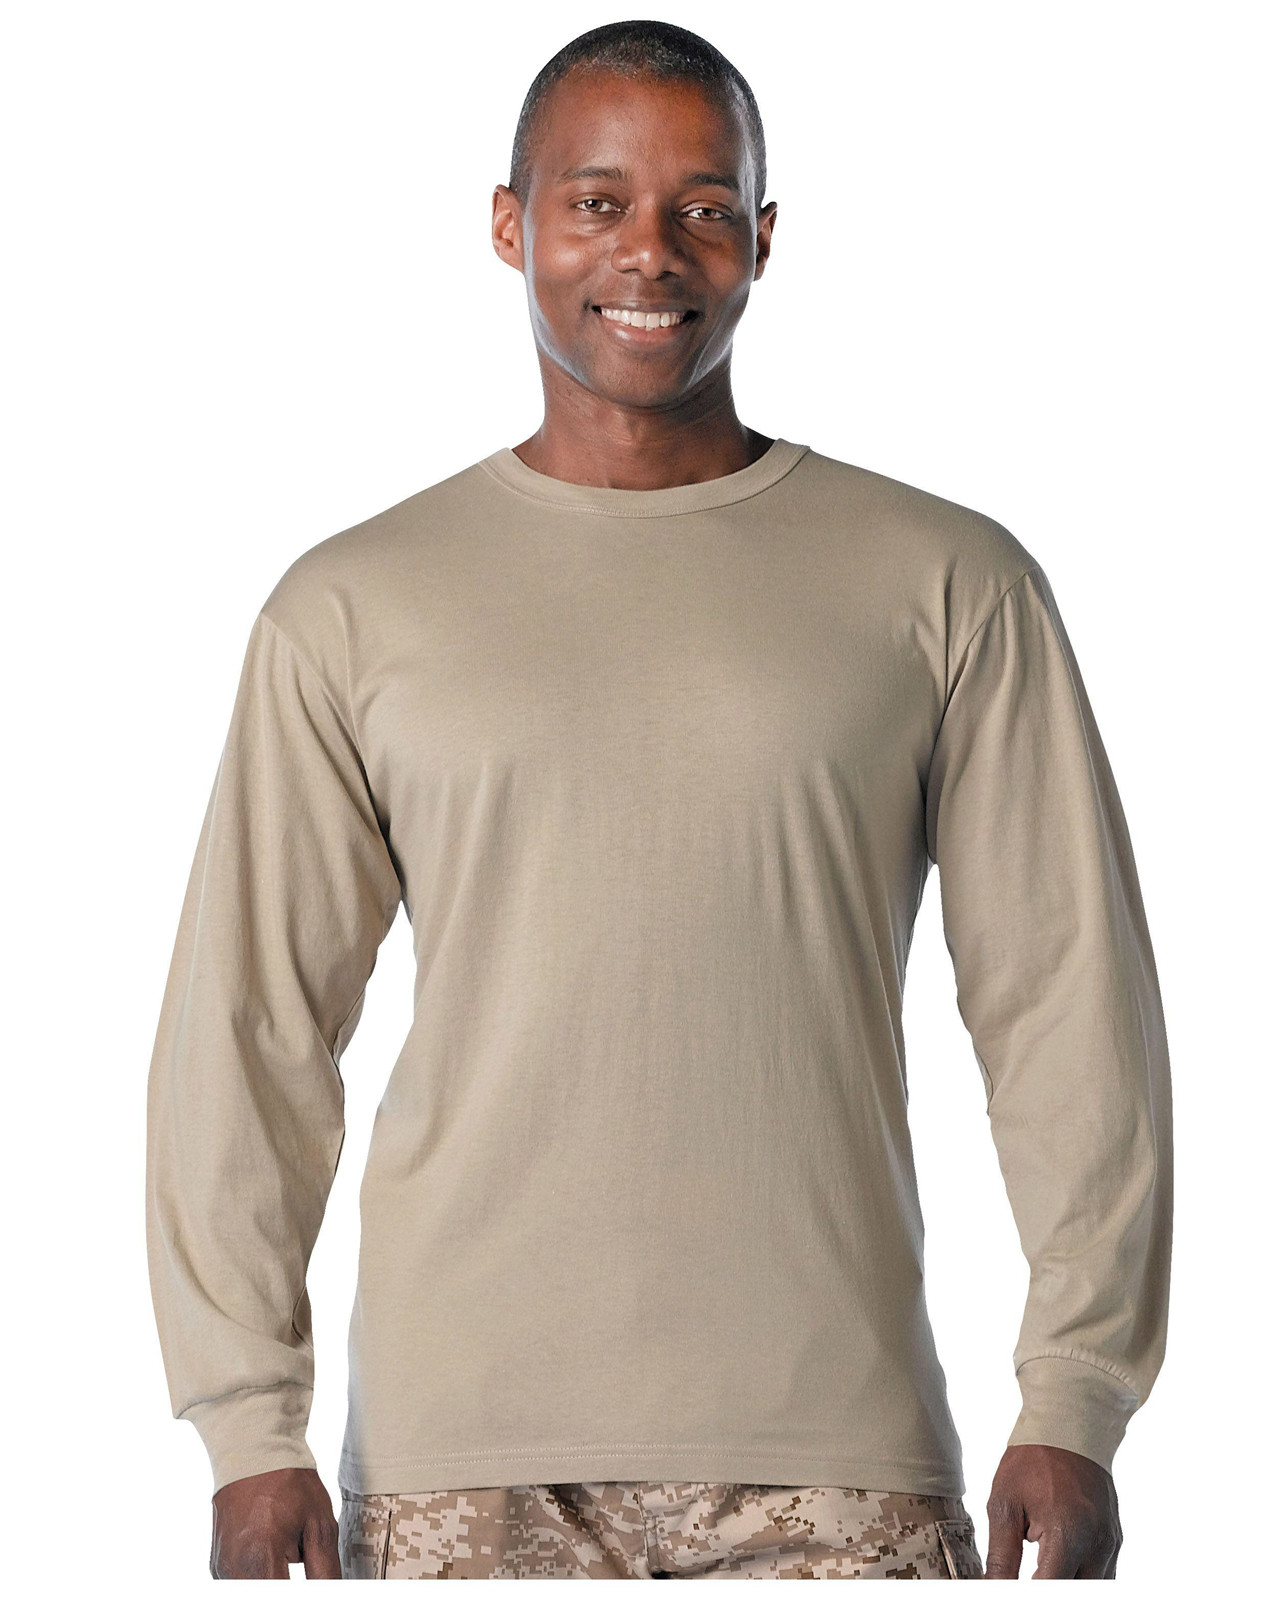 Rothco Långärmad T-shirt (Desert Sand, 2XL)